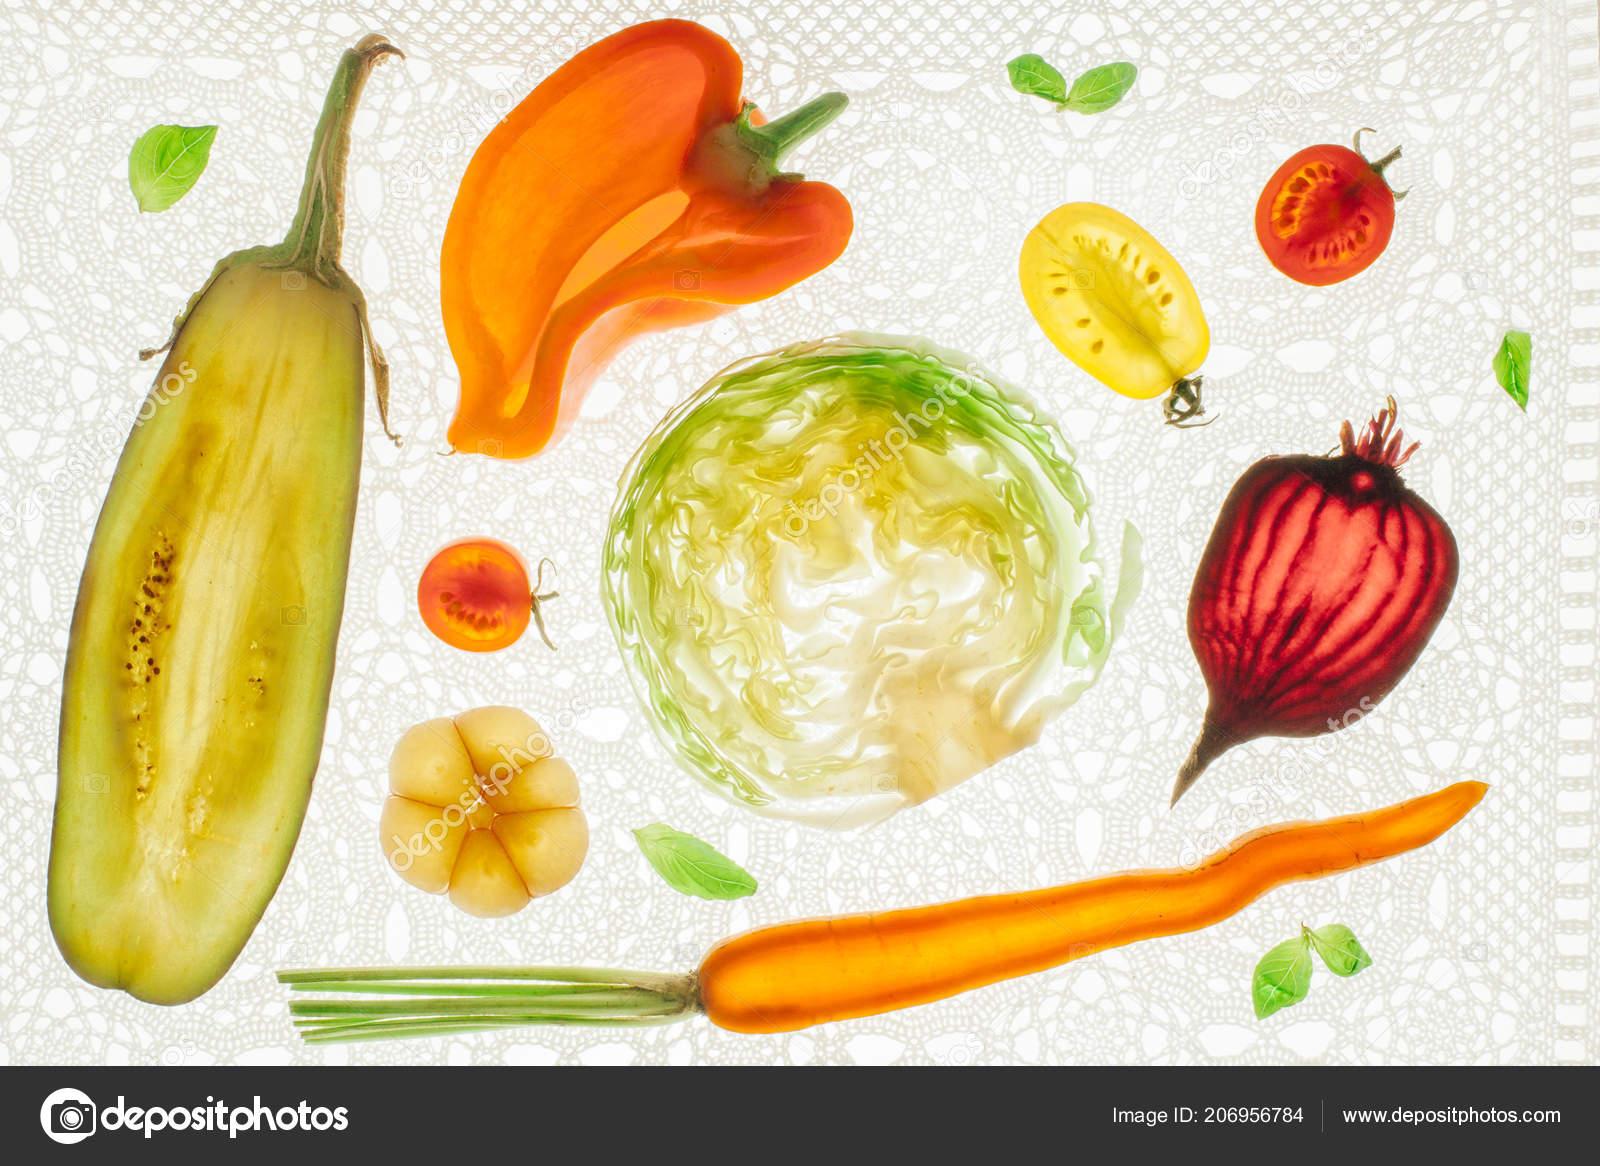 Wallpapers Food Desktop Wallpaper Different Vegetables